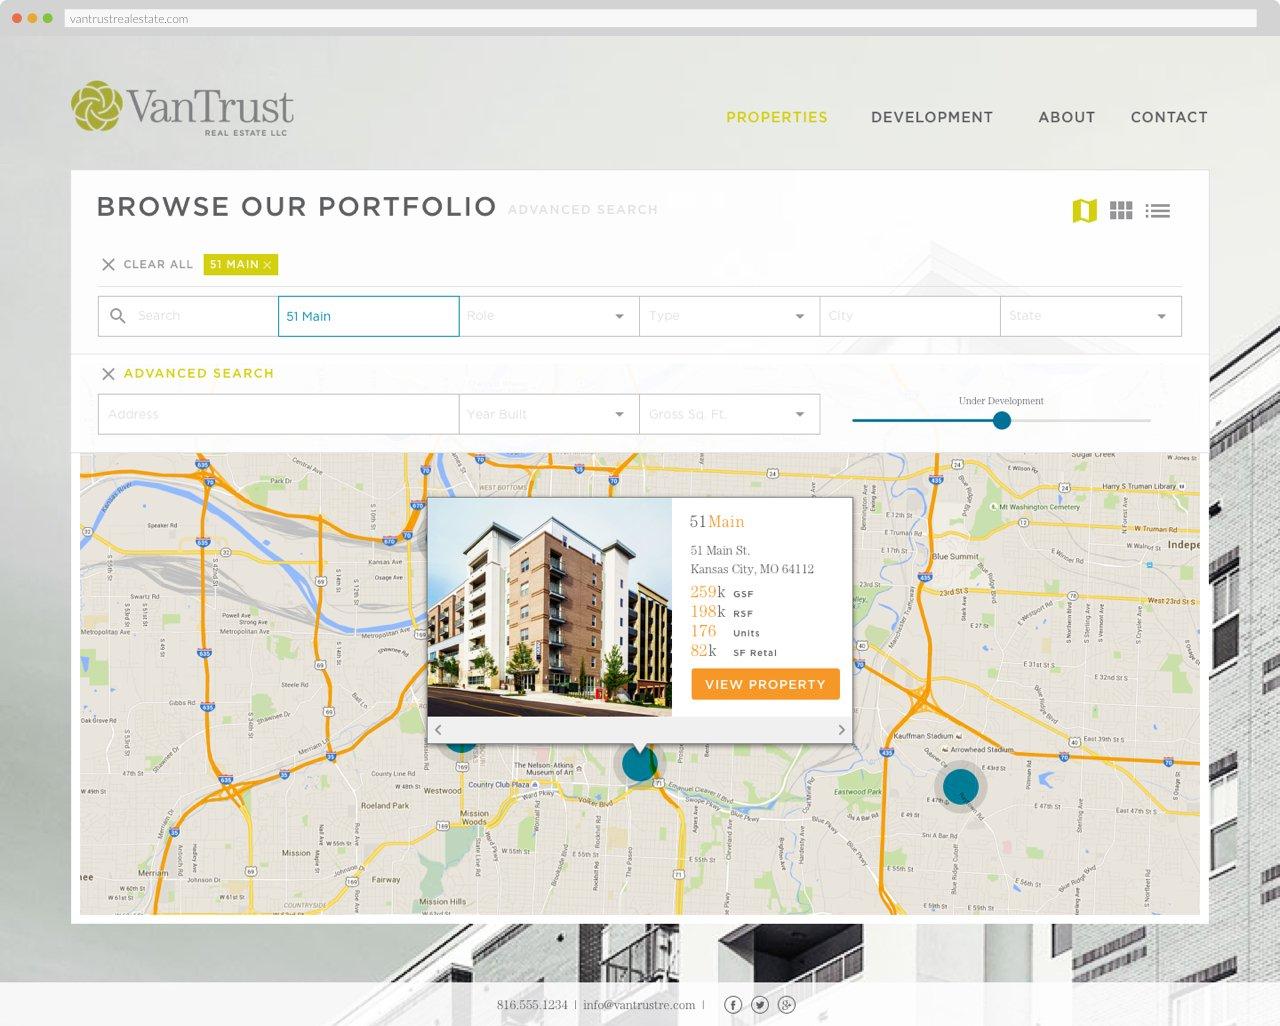 VanTrust Real Estate - Property Search, Map View